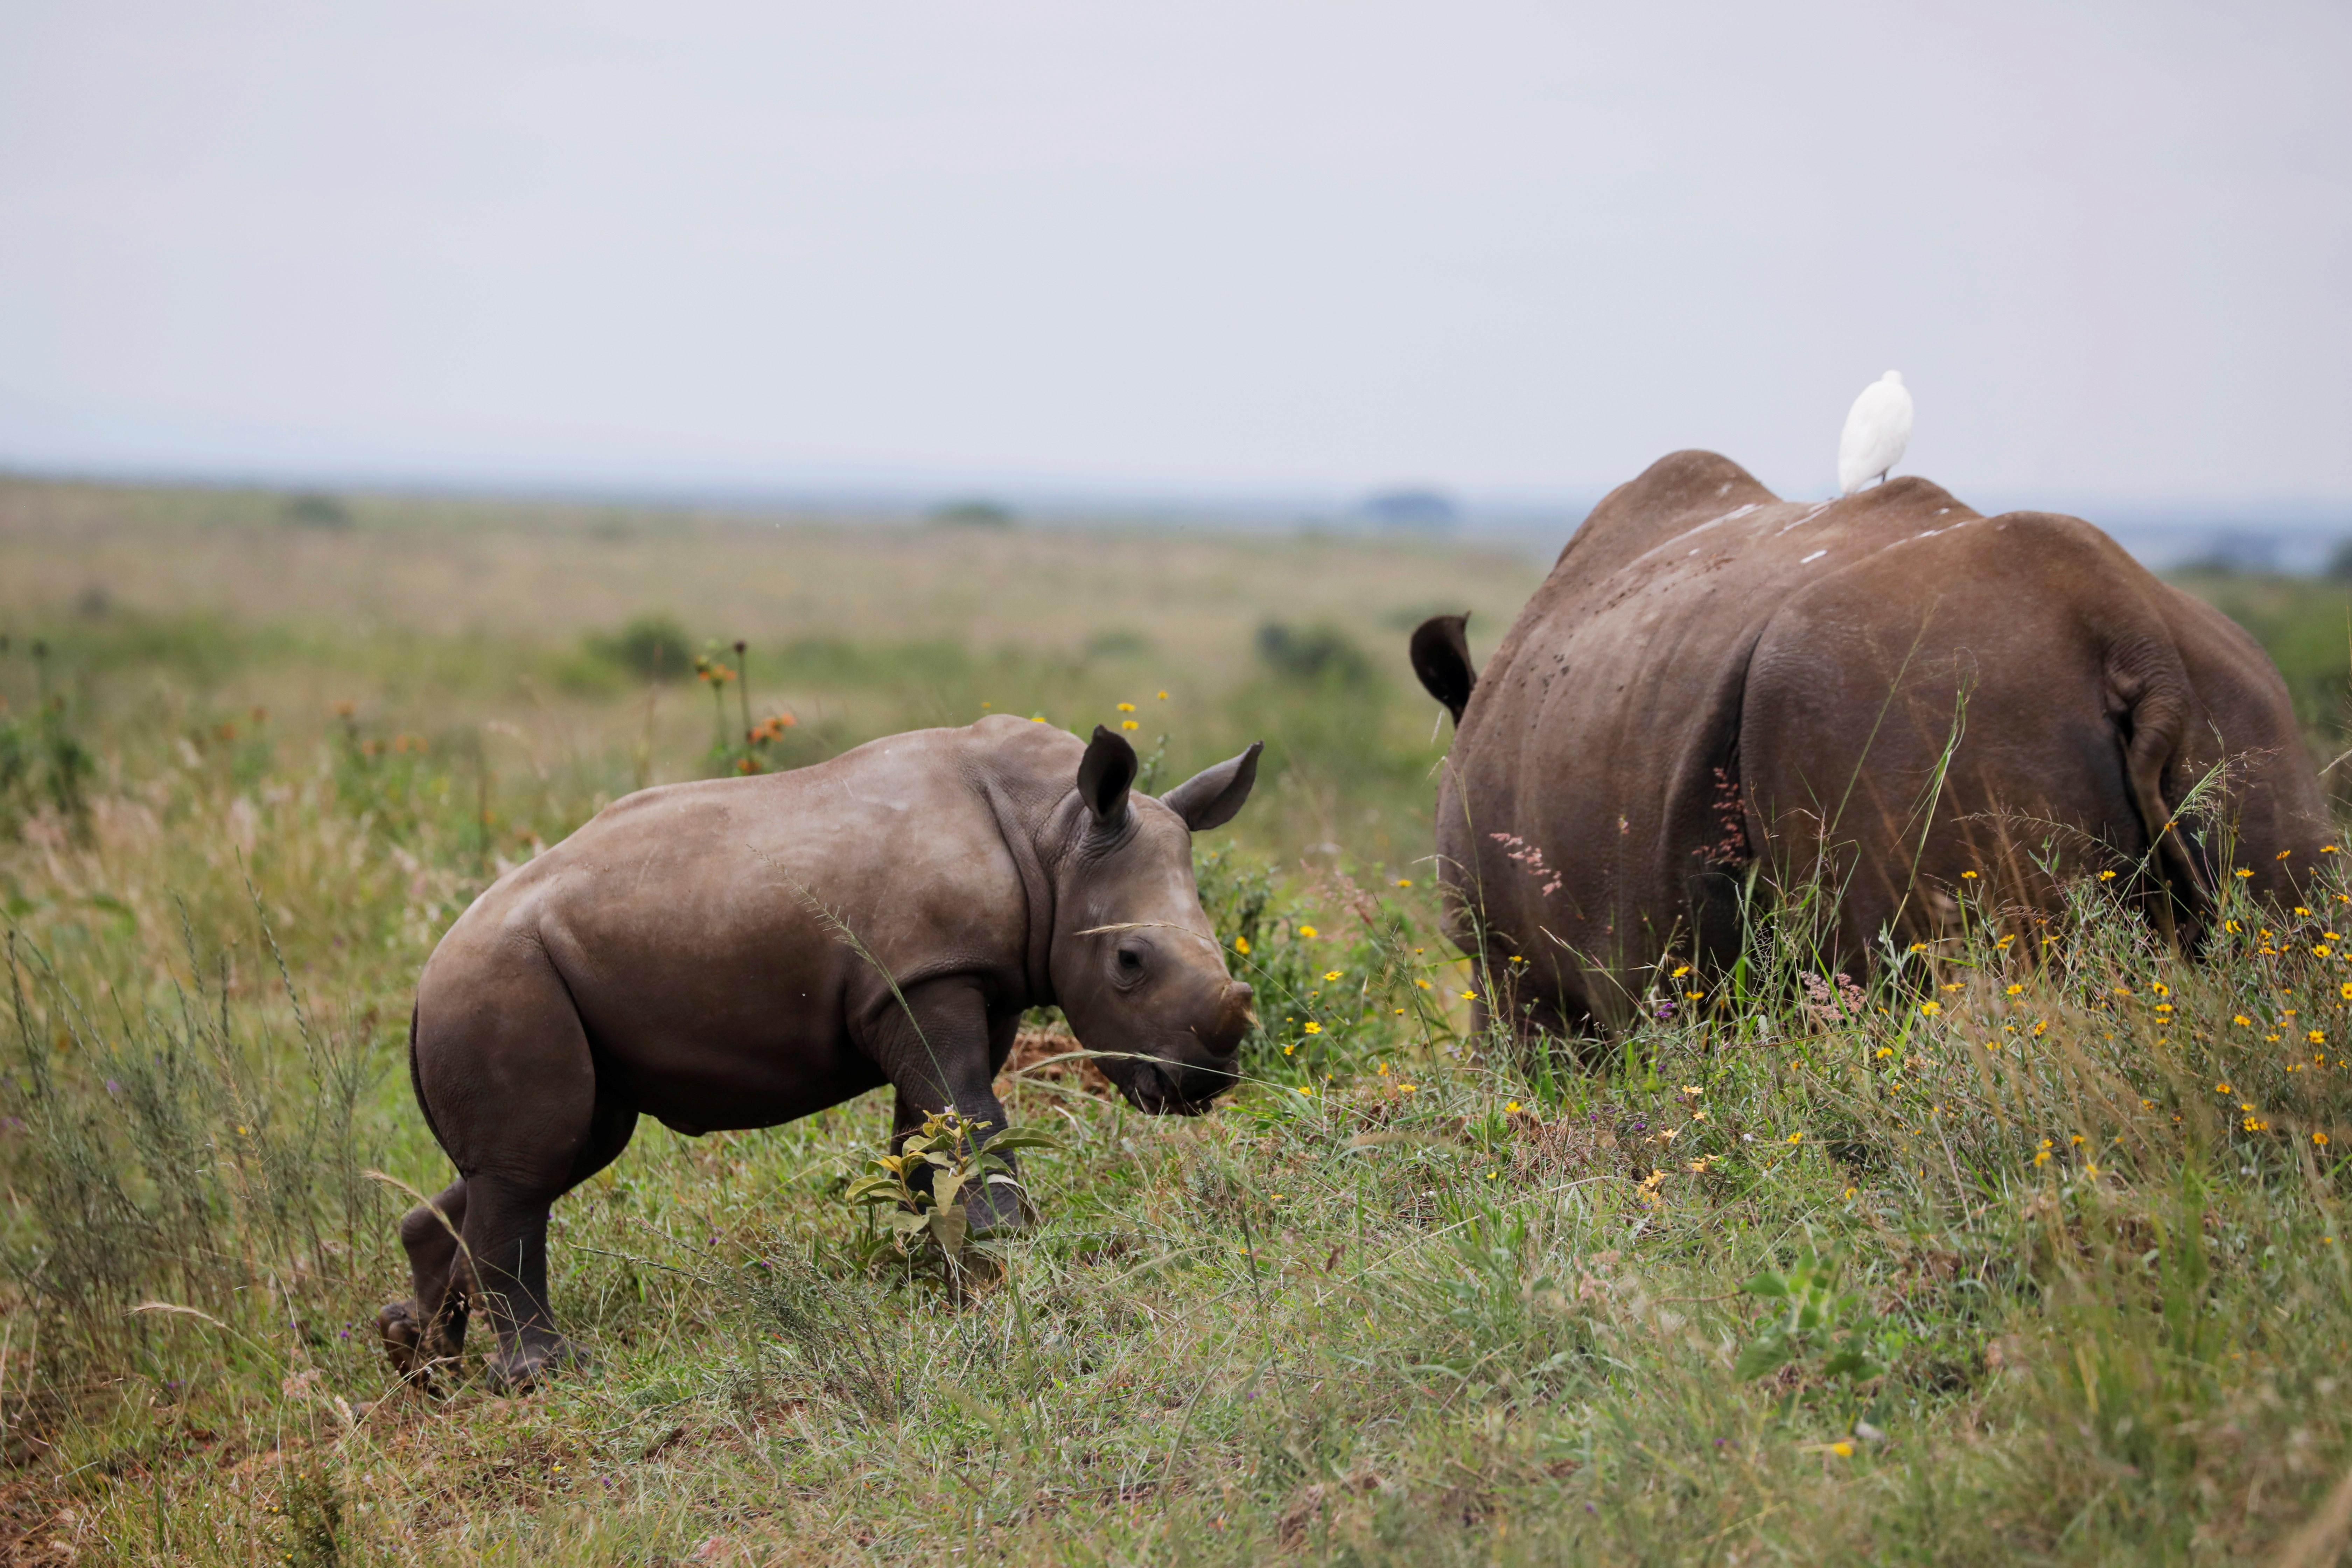 Extinction biodiversity environment nature animal welfare